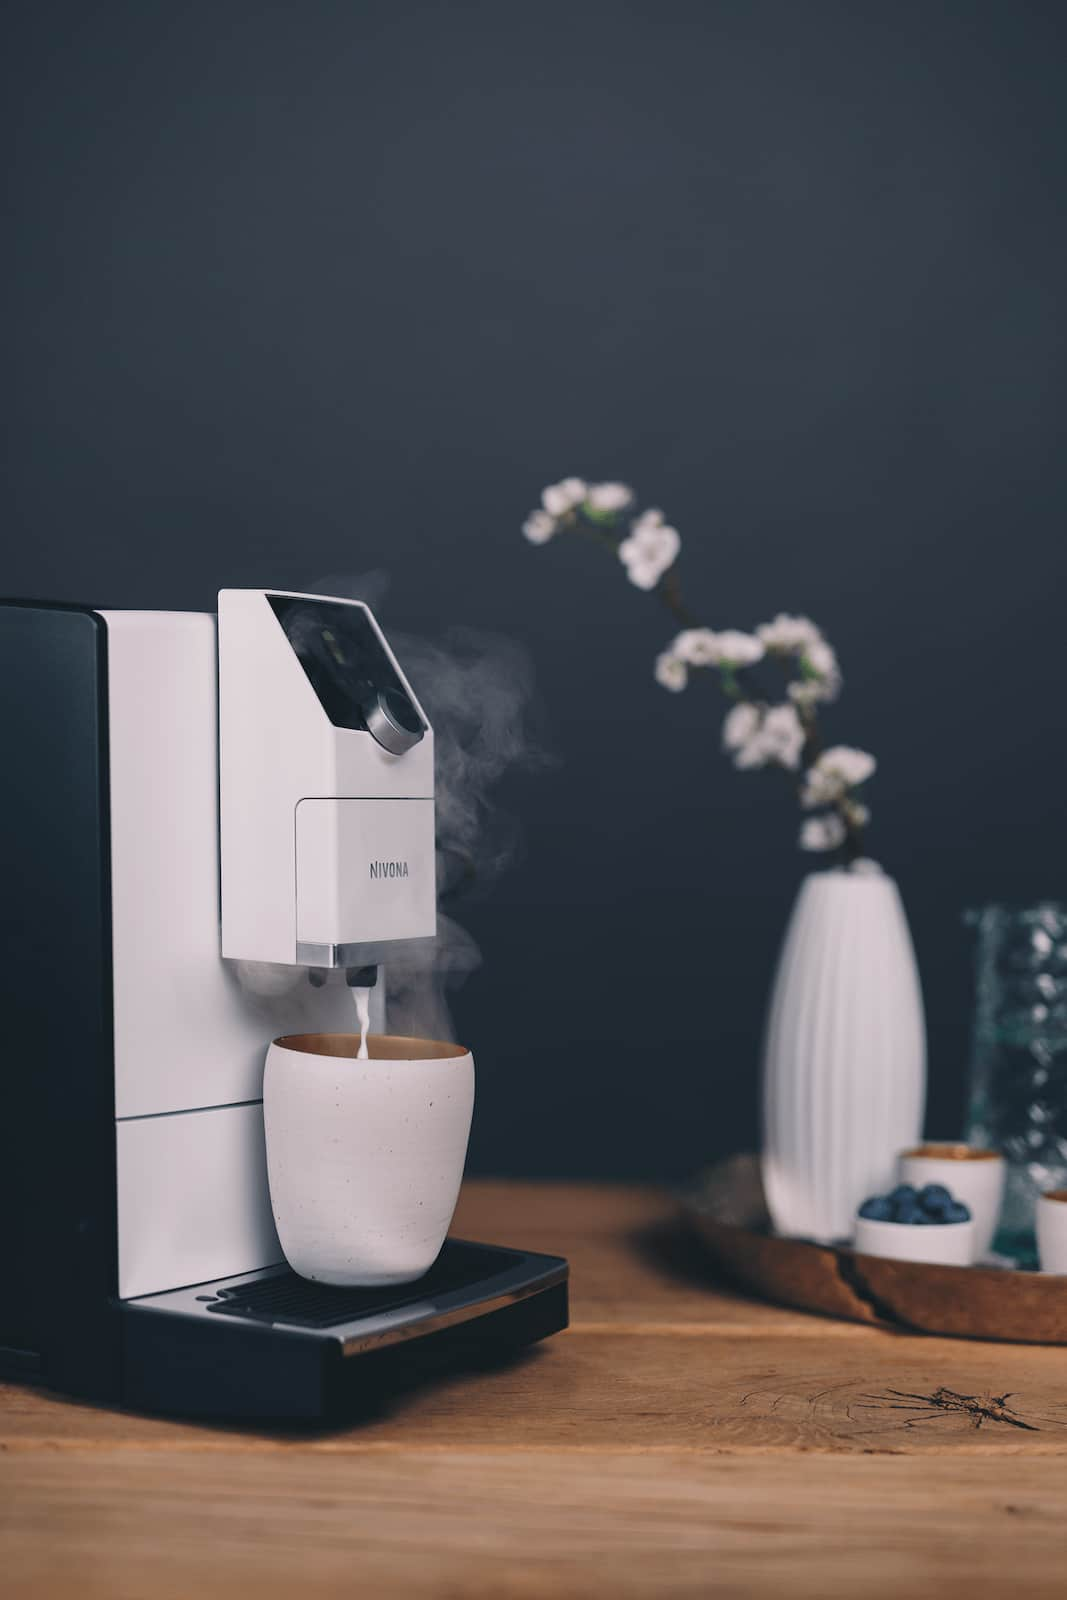 CafeRomatica NICR 796 NIVONA